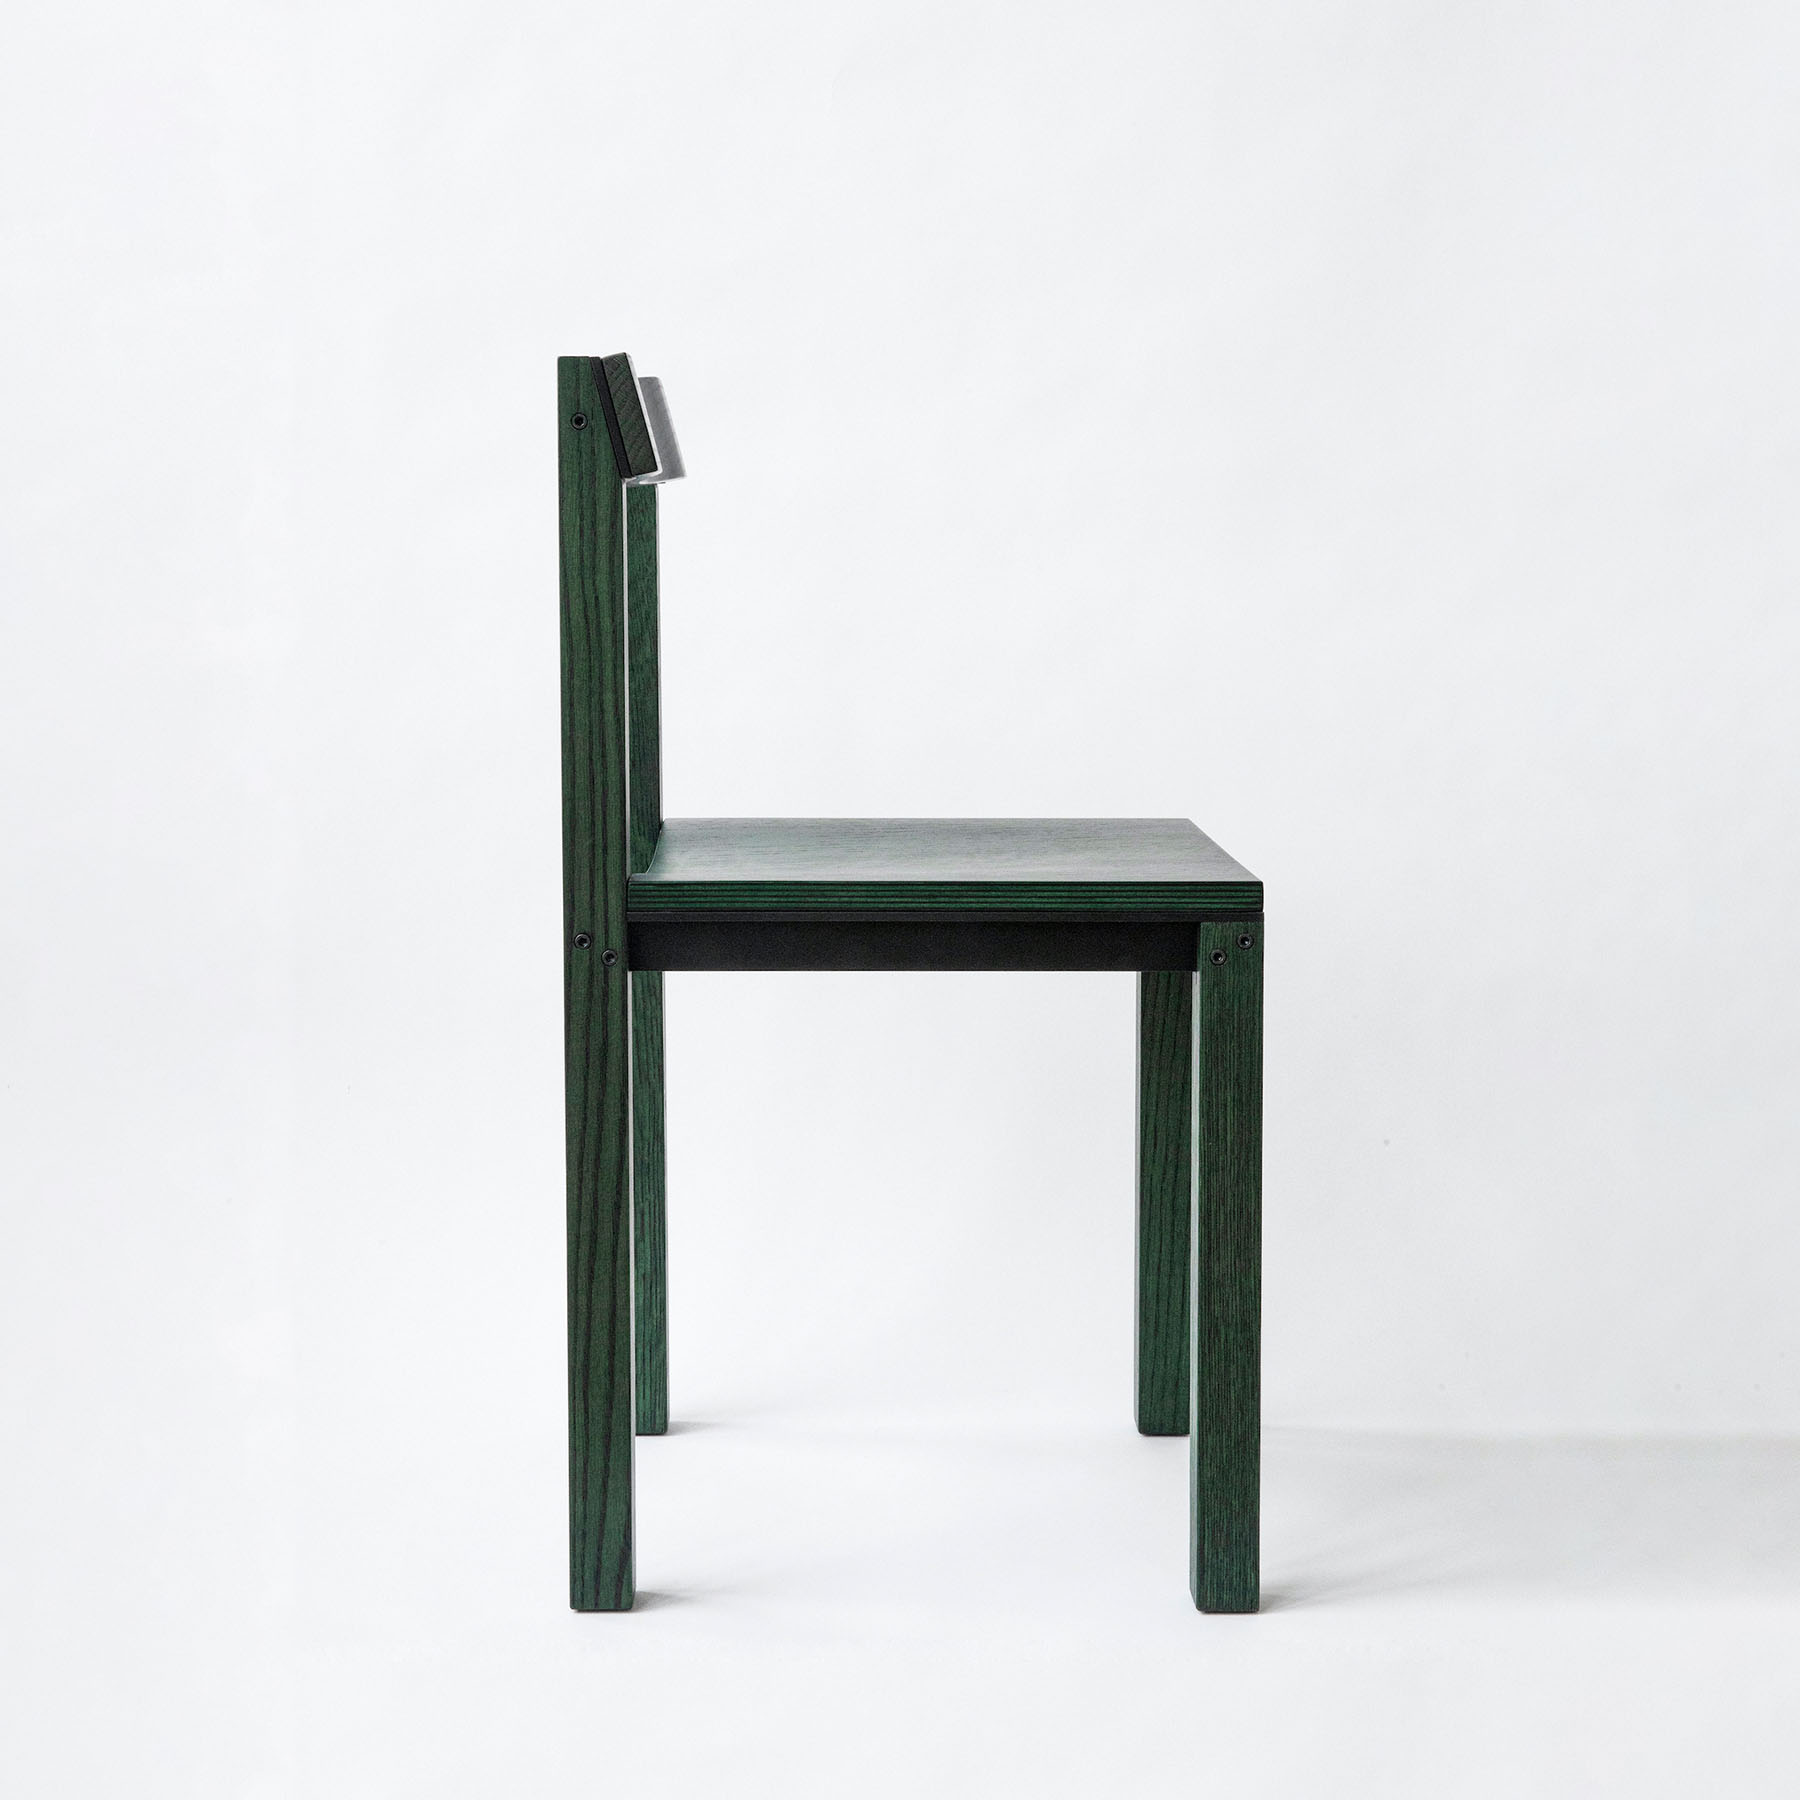 TAL Chair by Leonard Kadid